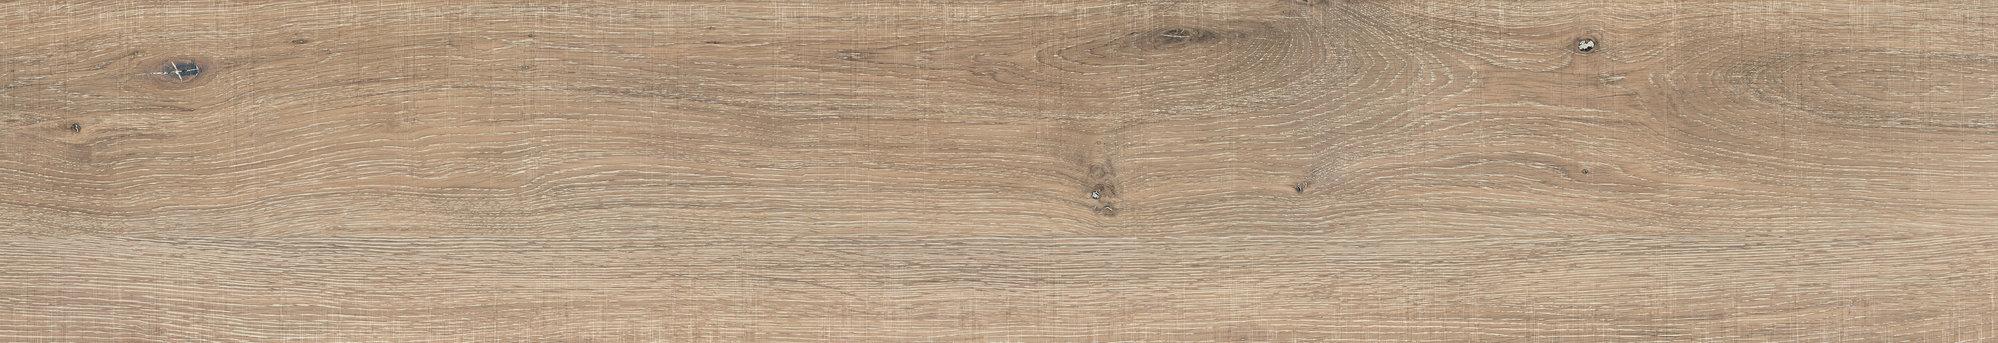 Керамогранит Peronda Whistler Taupe/R (23927) 24x151